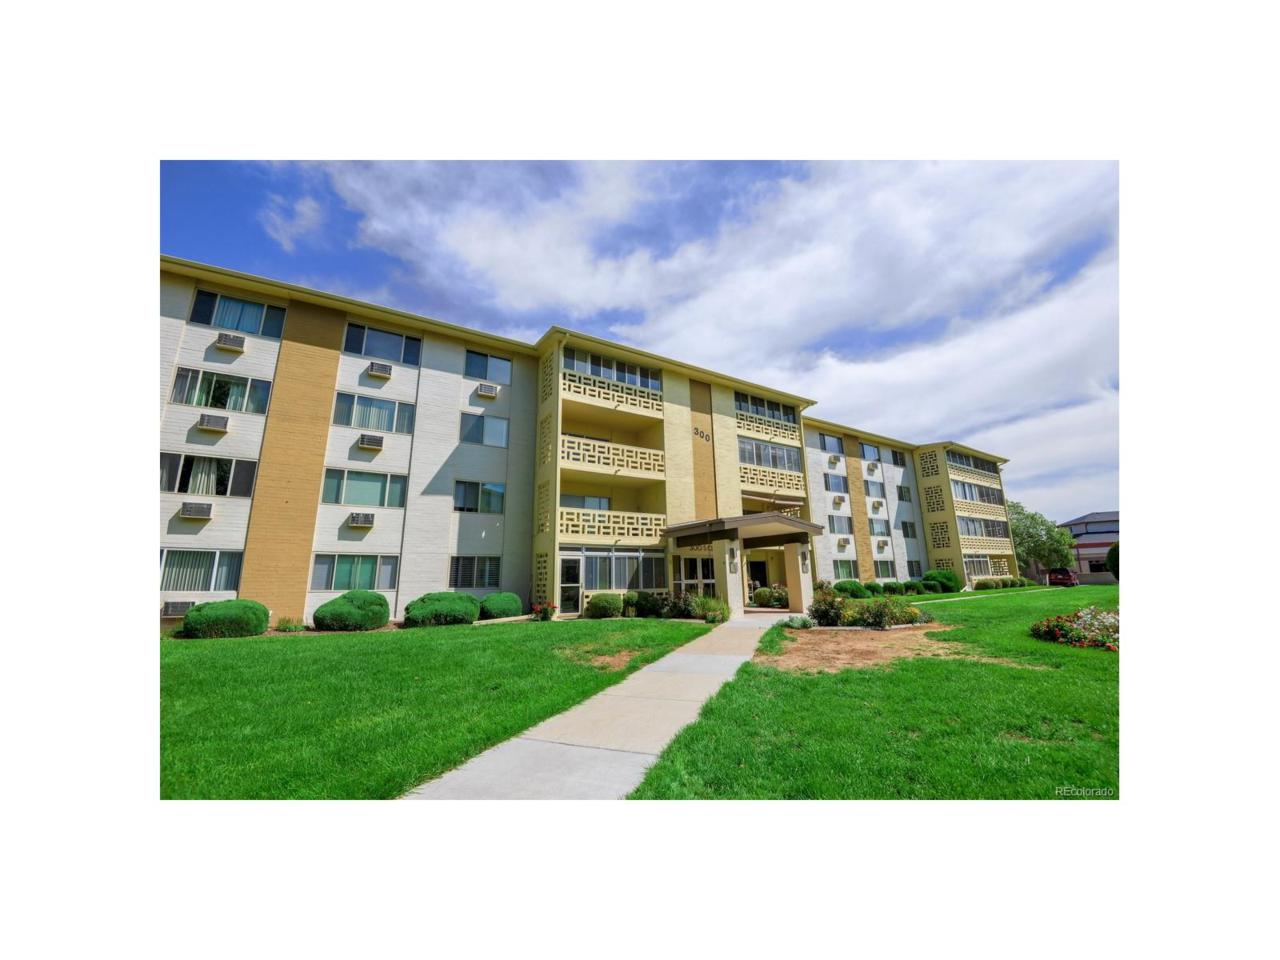 300 S Clinton Street 4A, Denver, CO 80247 (MLS #6292649) :: 8z Real Estate